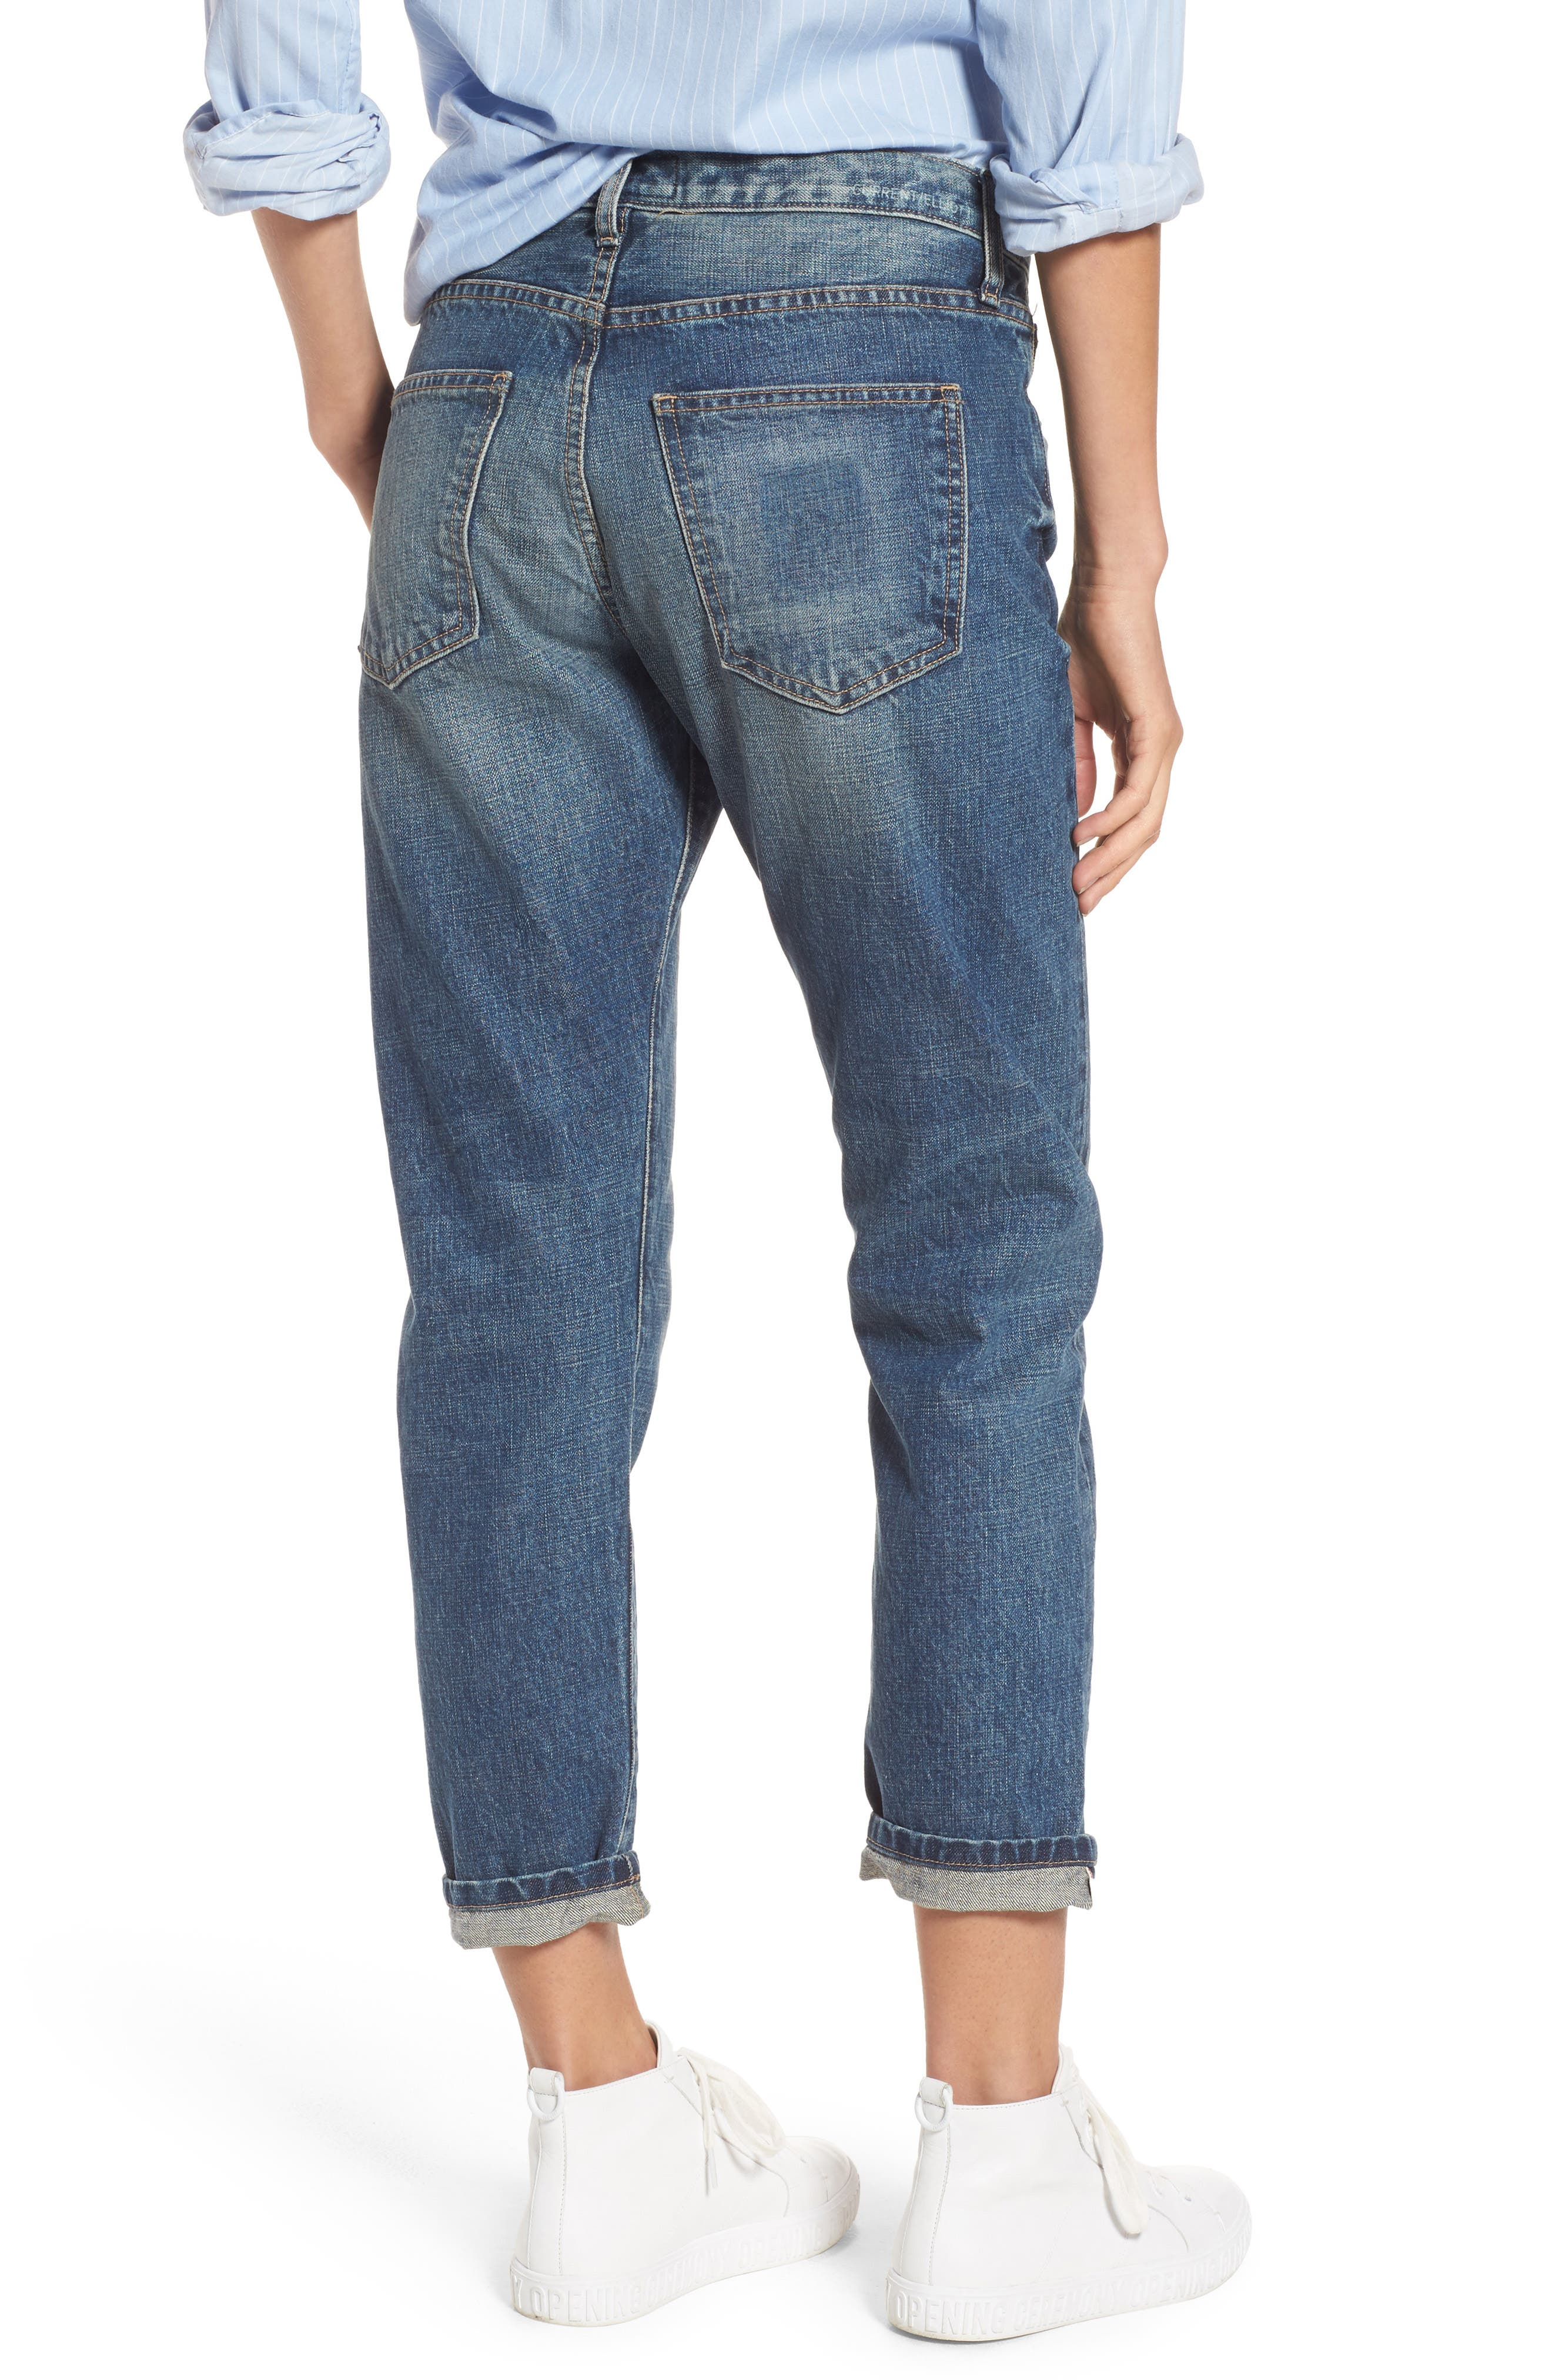 Alternate Image 2  - Current/Elliott The Selvedge High Waist Crop Jeans (Hemet)